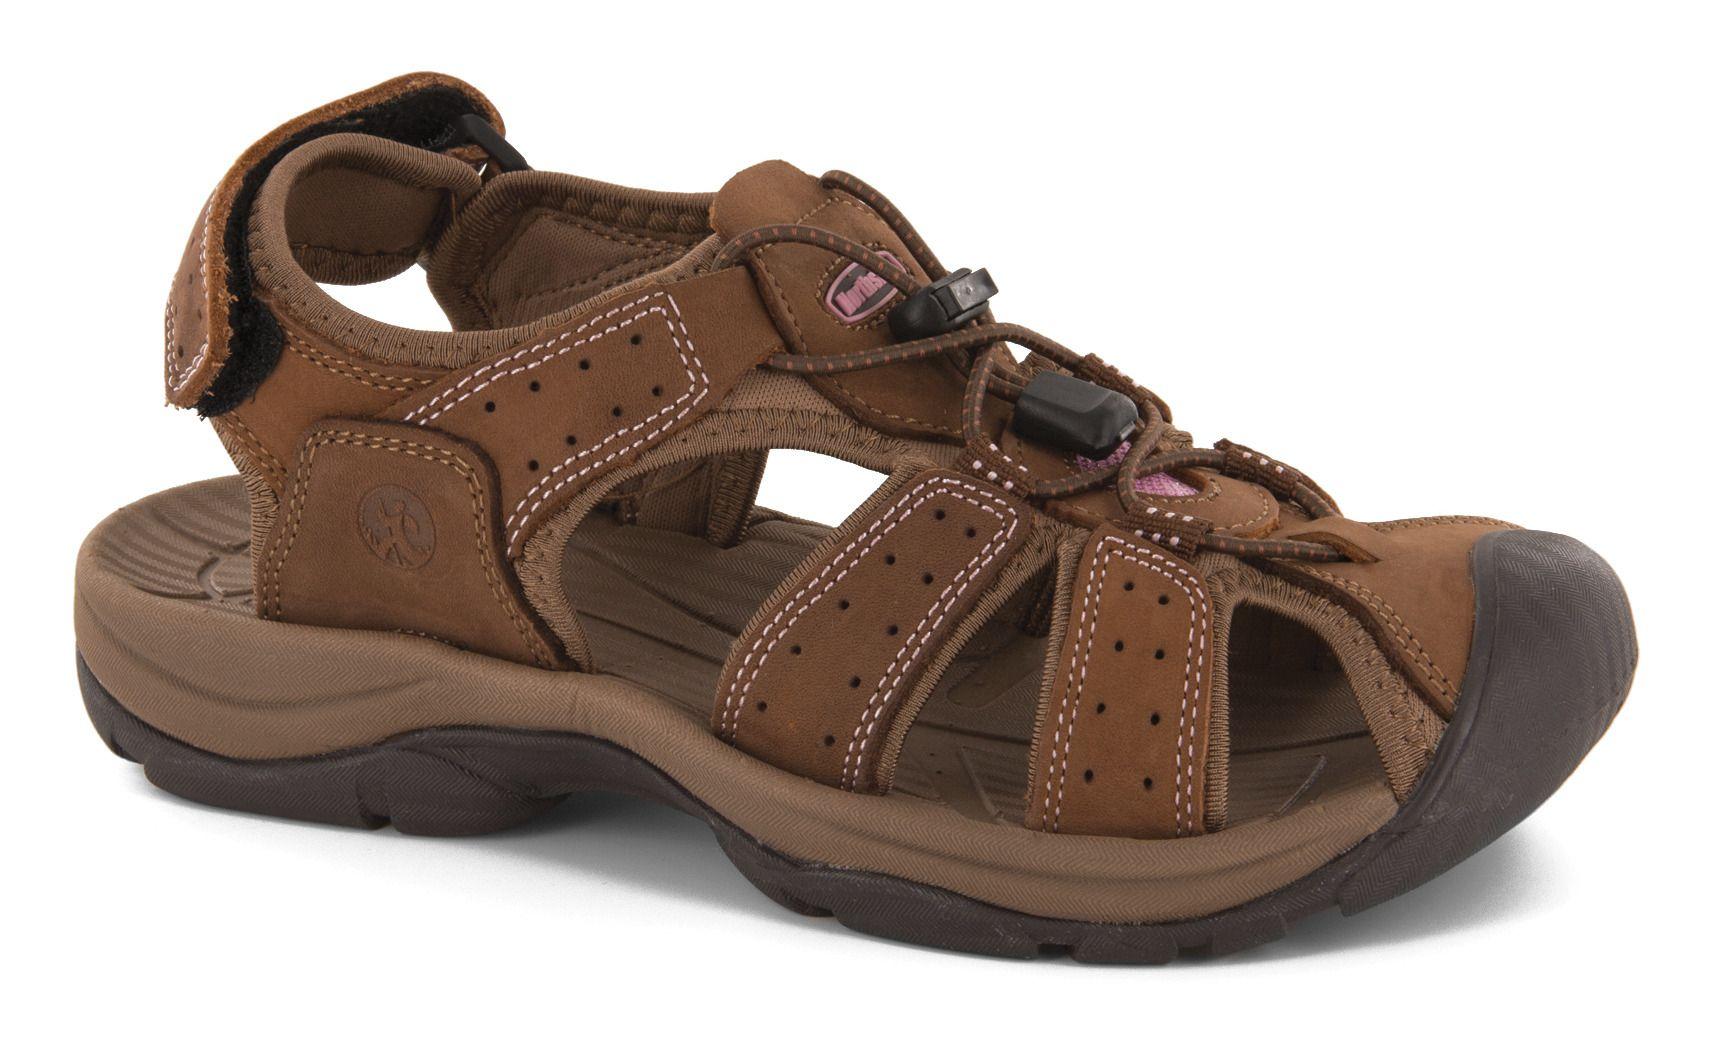 Northside USA Women's 'Trinidad' ClosedToe Sandal